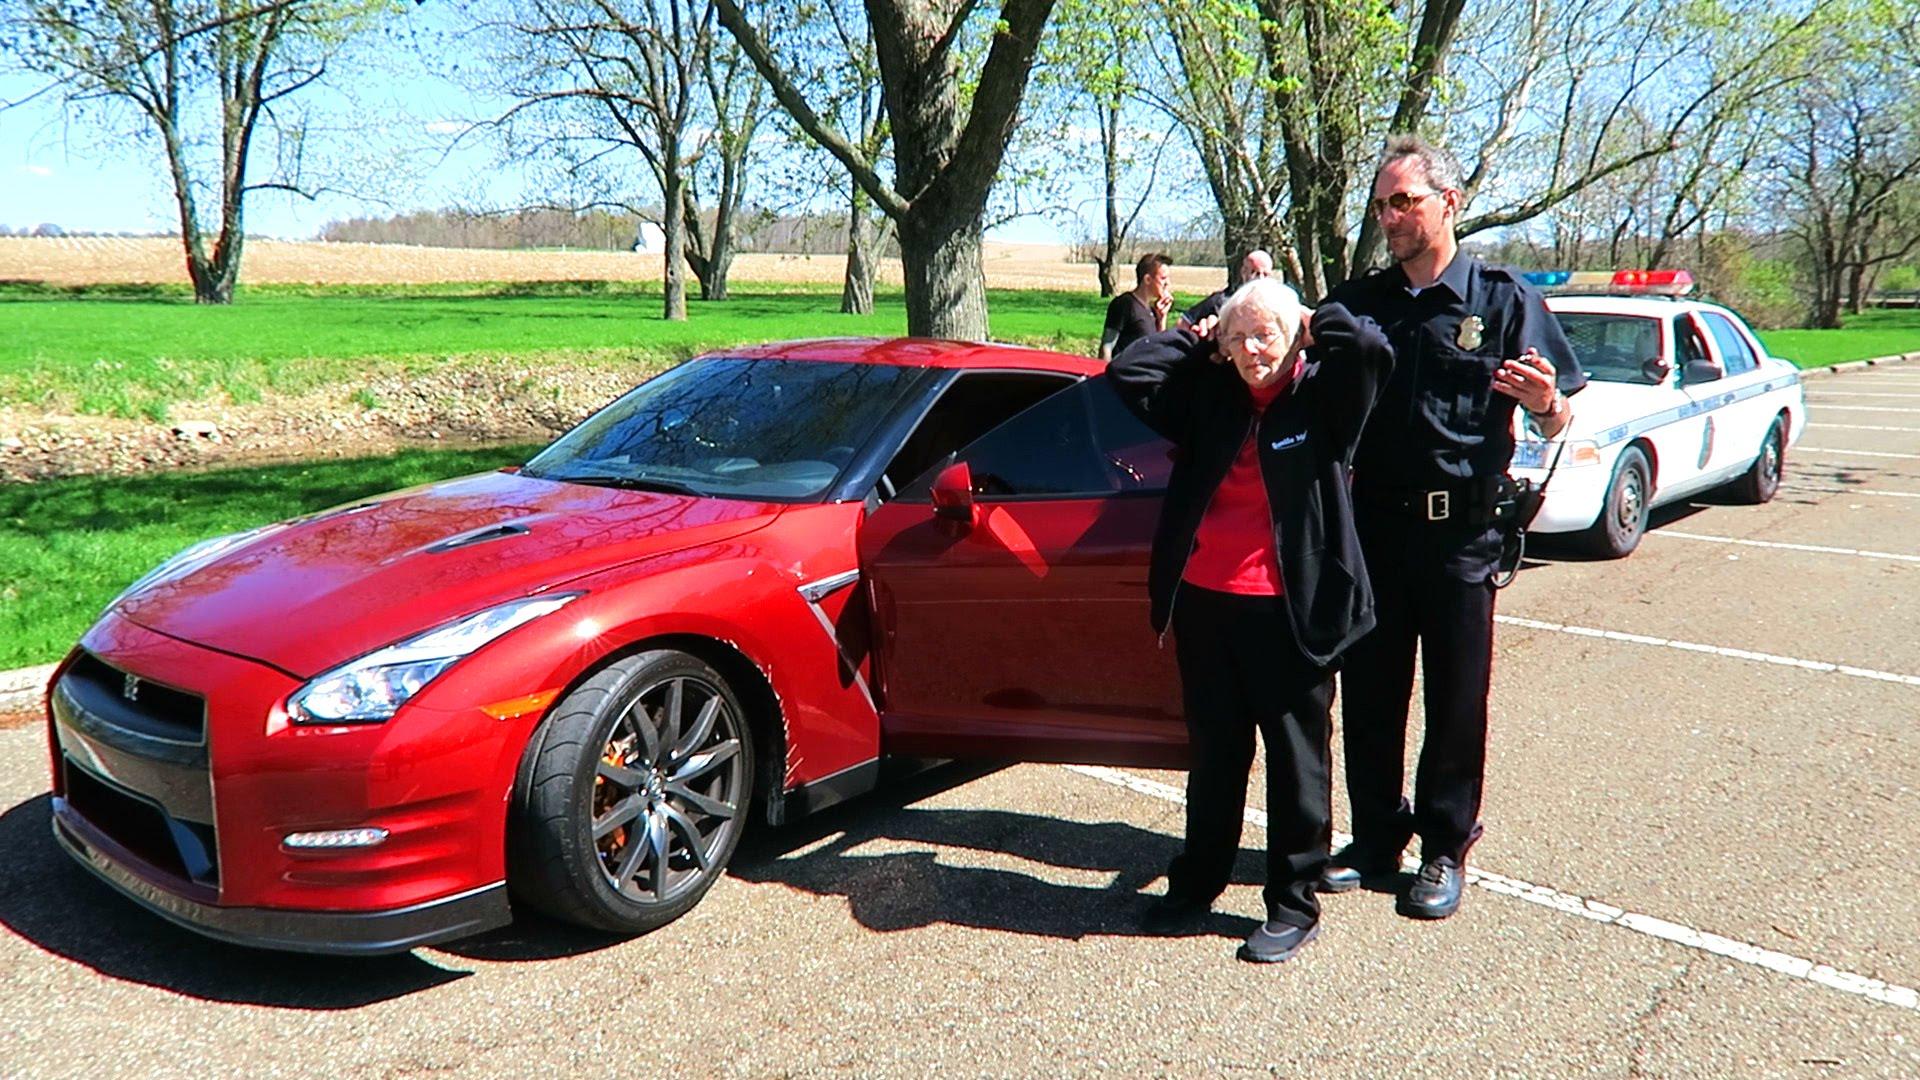 Grandma Gets Arrested PRANK